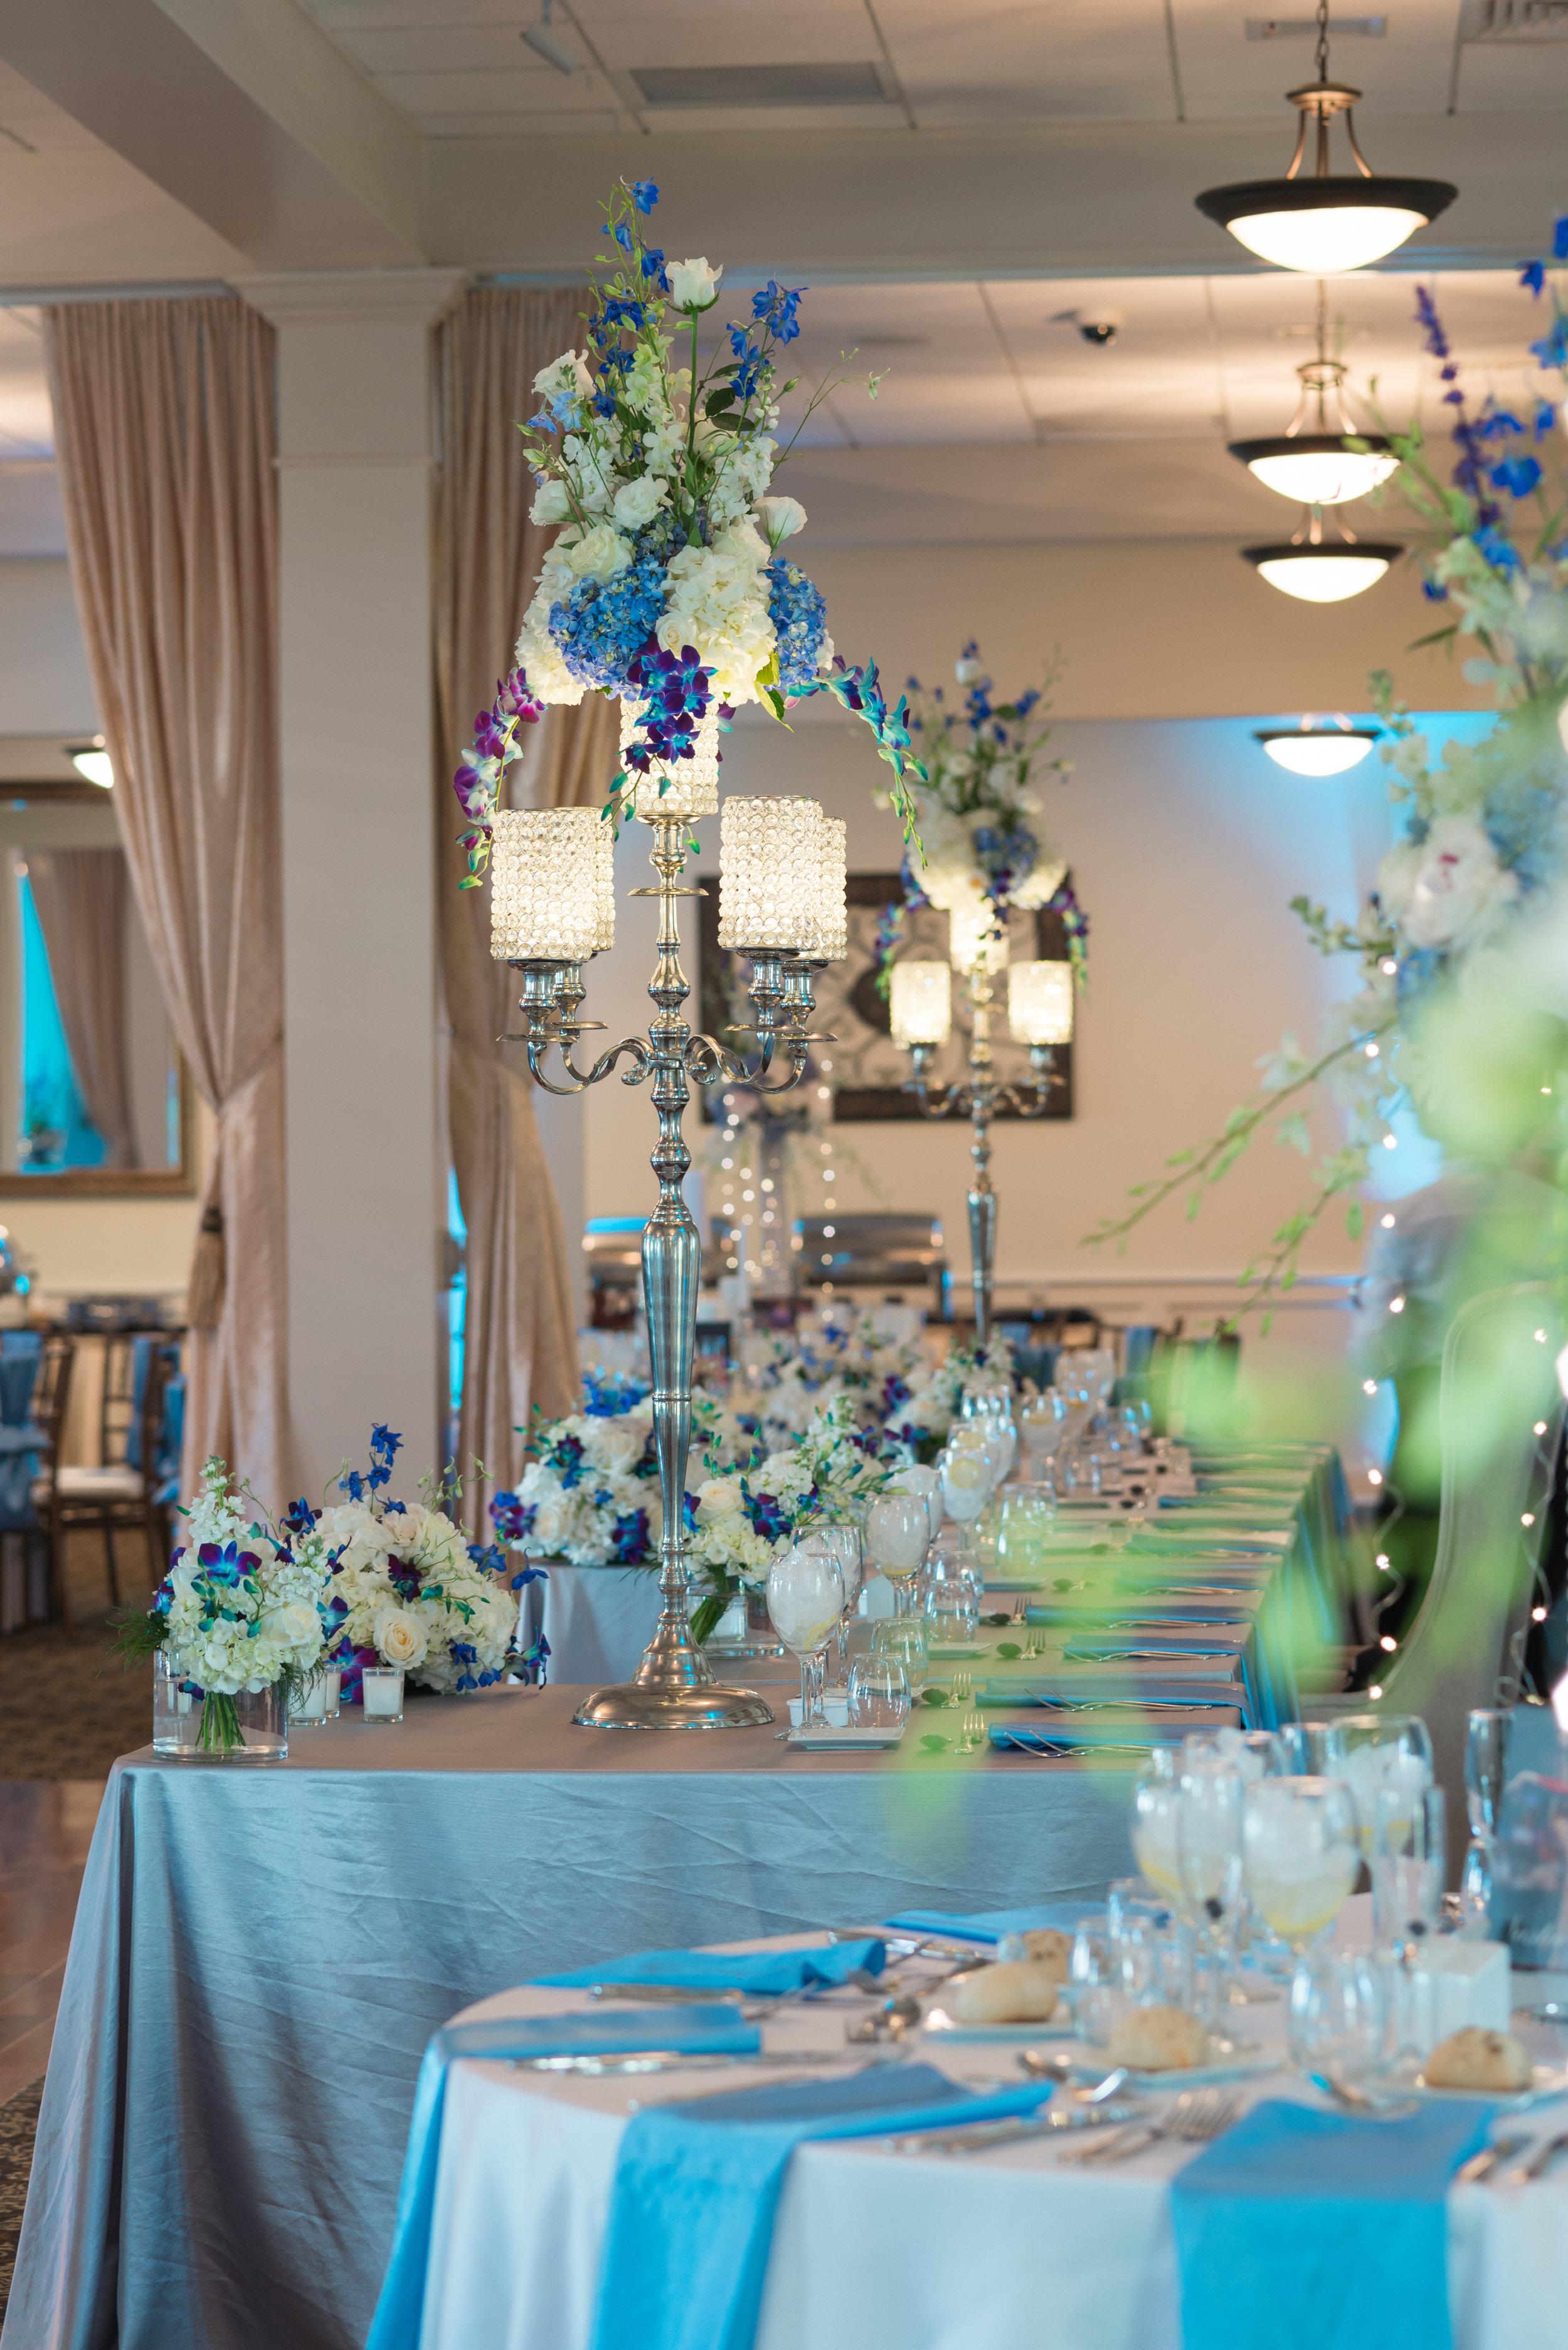 Carl-Kerridge-Photography-North-Beach-Wedding-May-2015-099.jpg